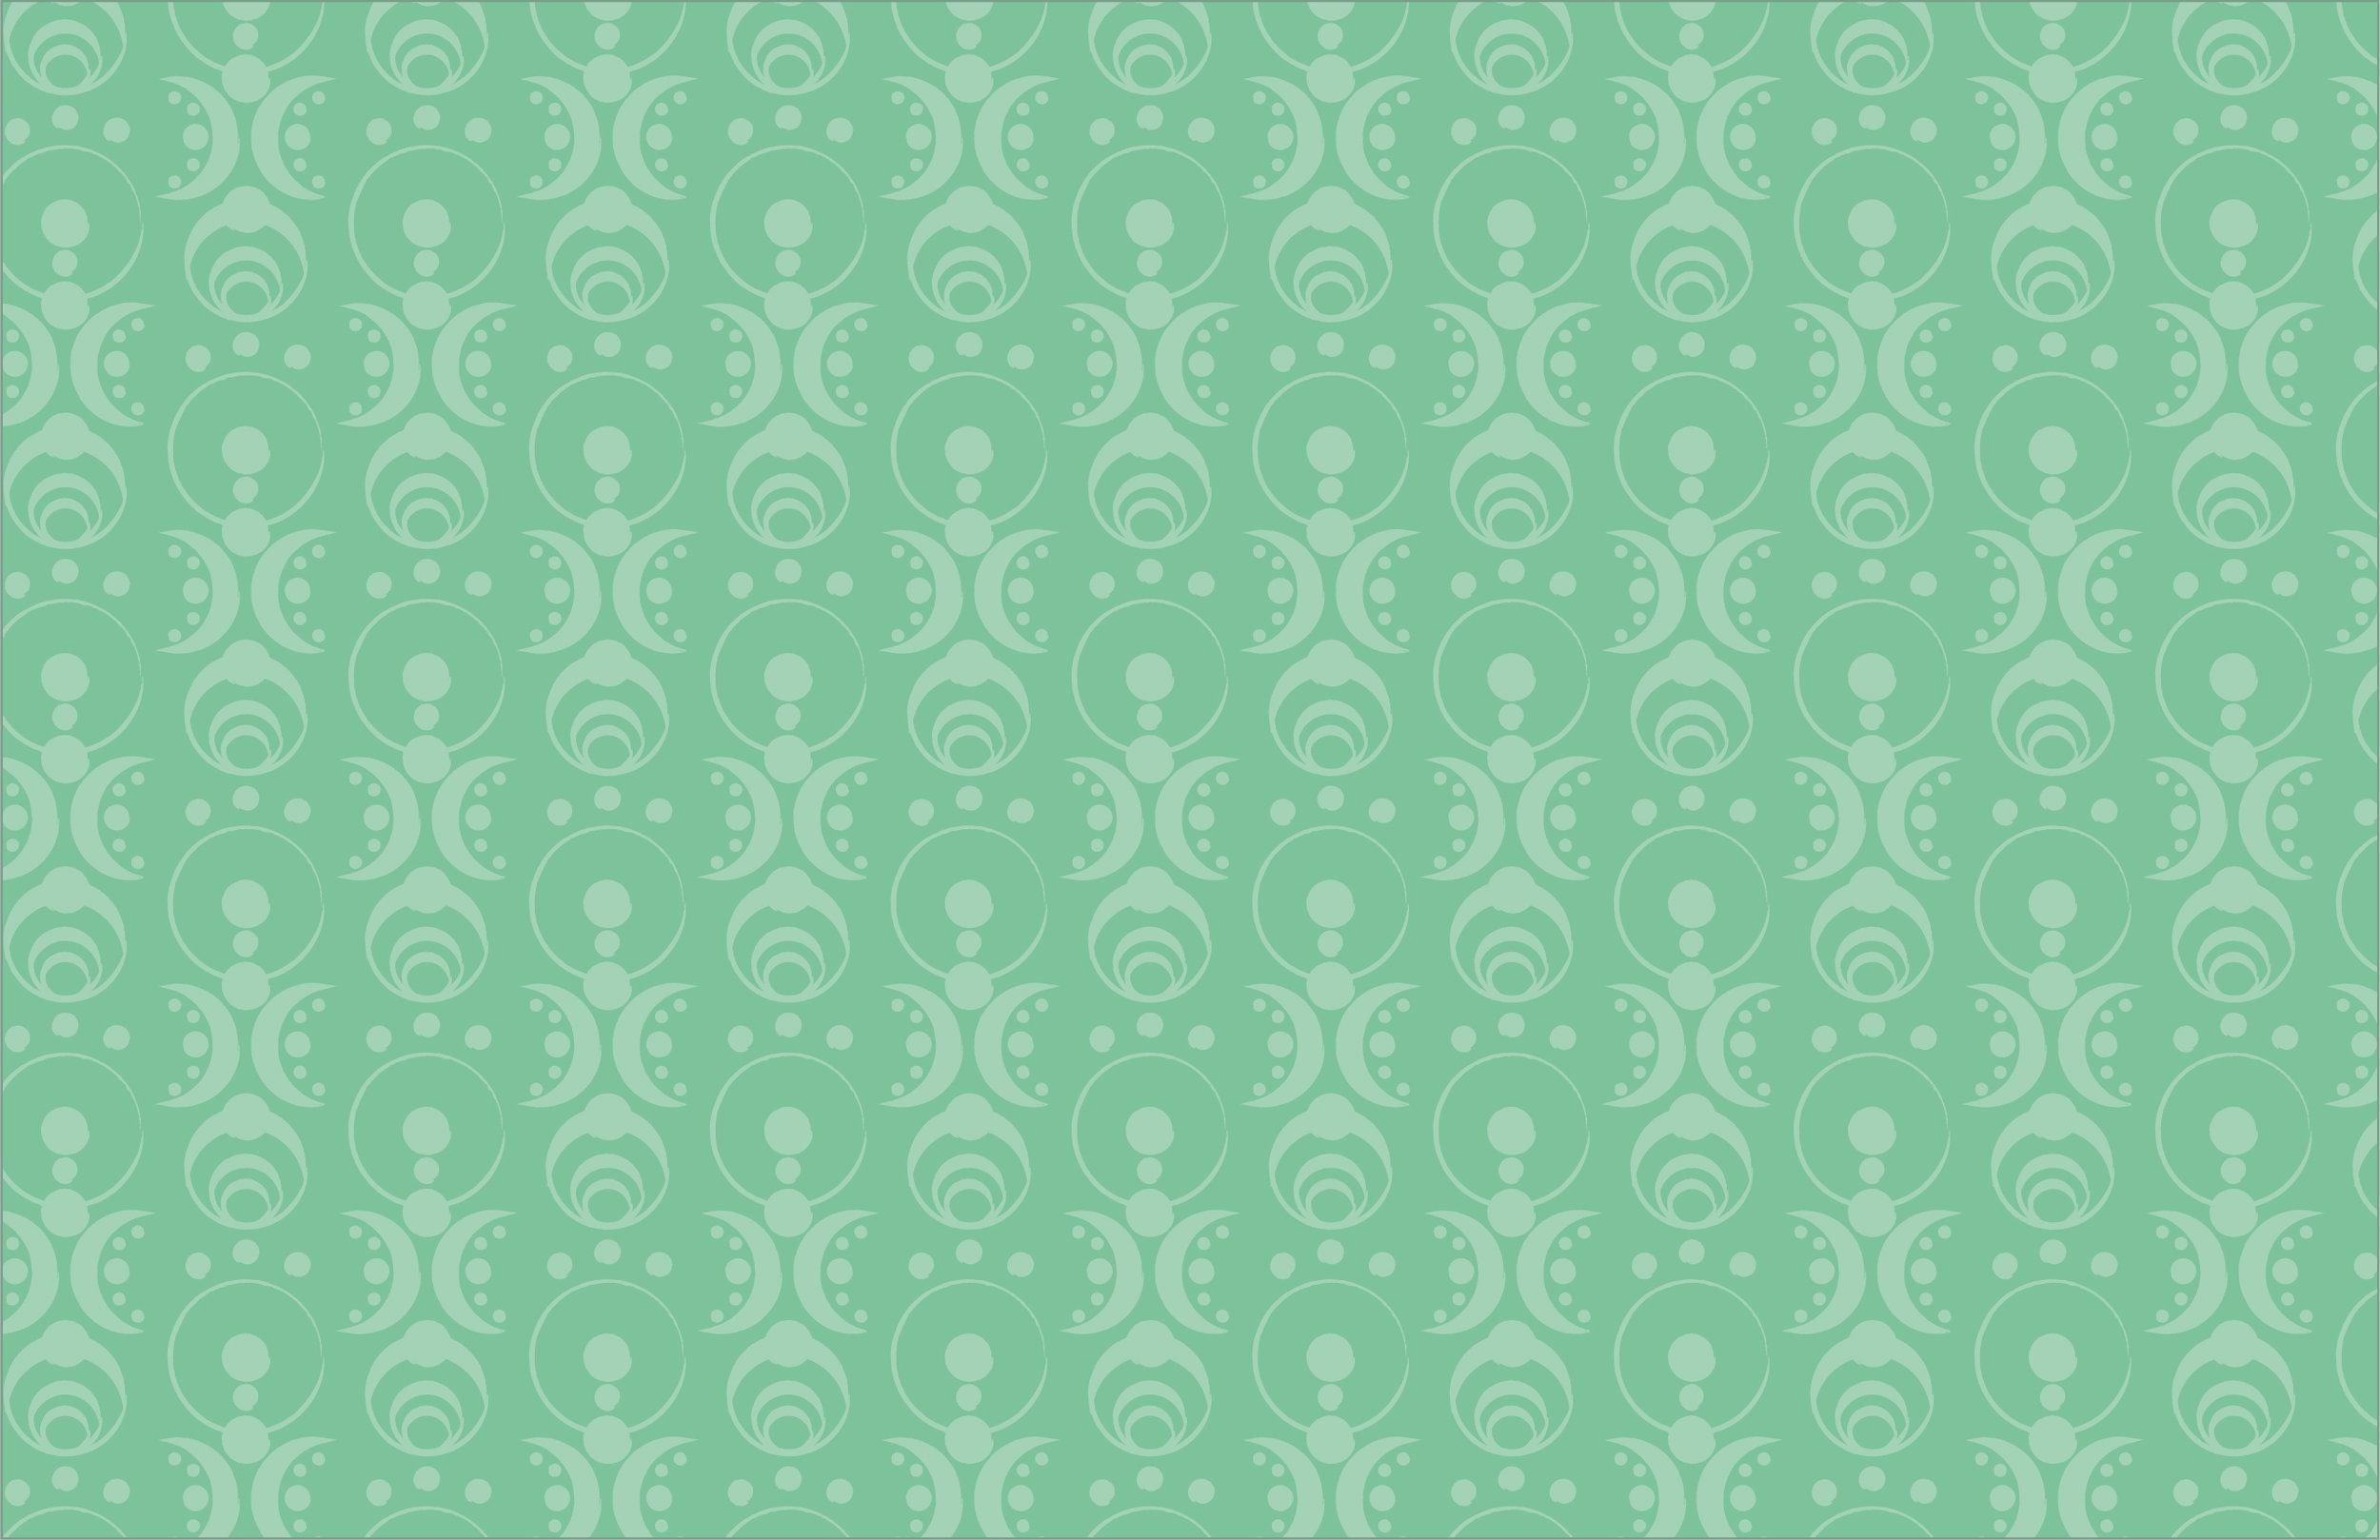 Hurley_pattern-17.jpg